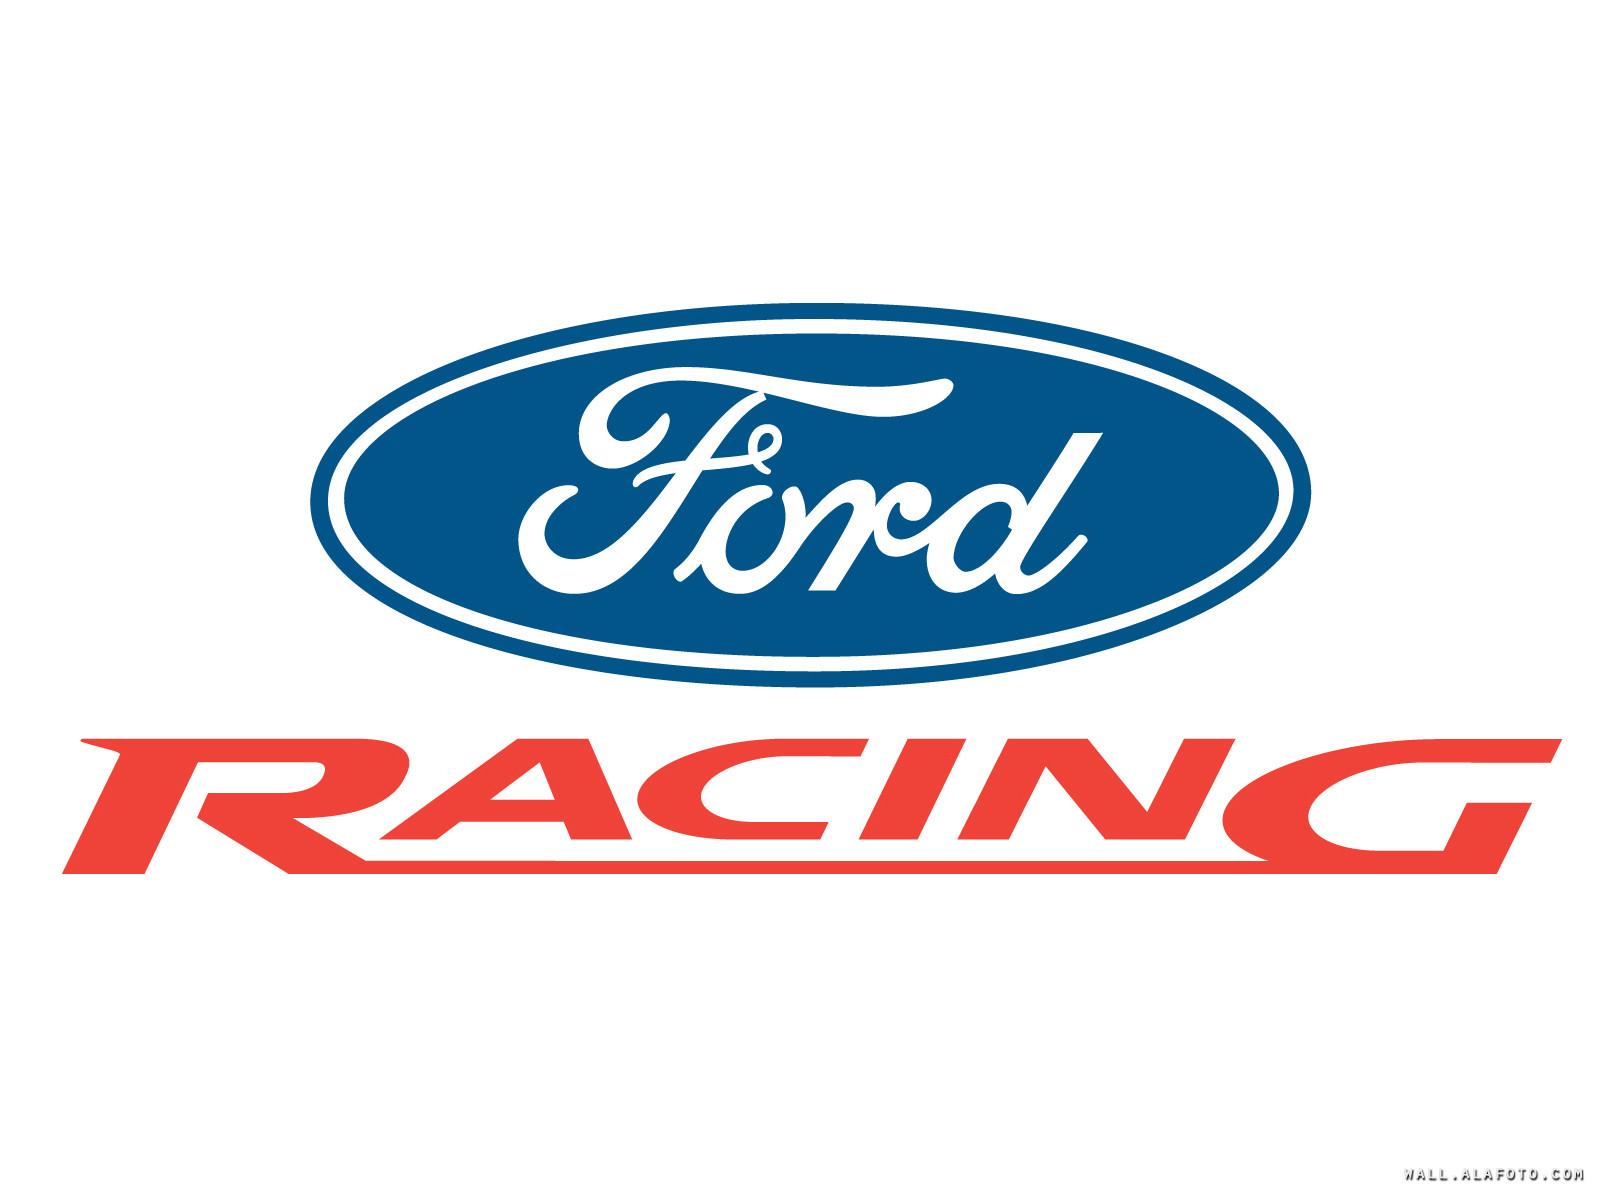 Ford Racing Logo Wallpaper   Cars Wallpapers 594 ilikewalls 1600x1200